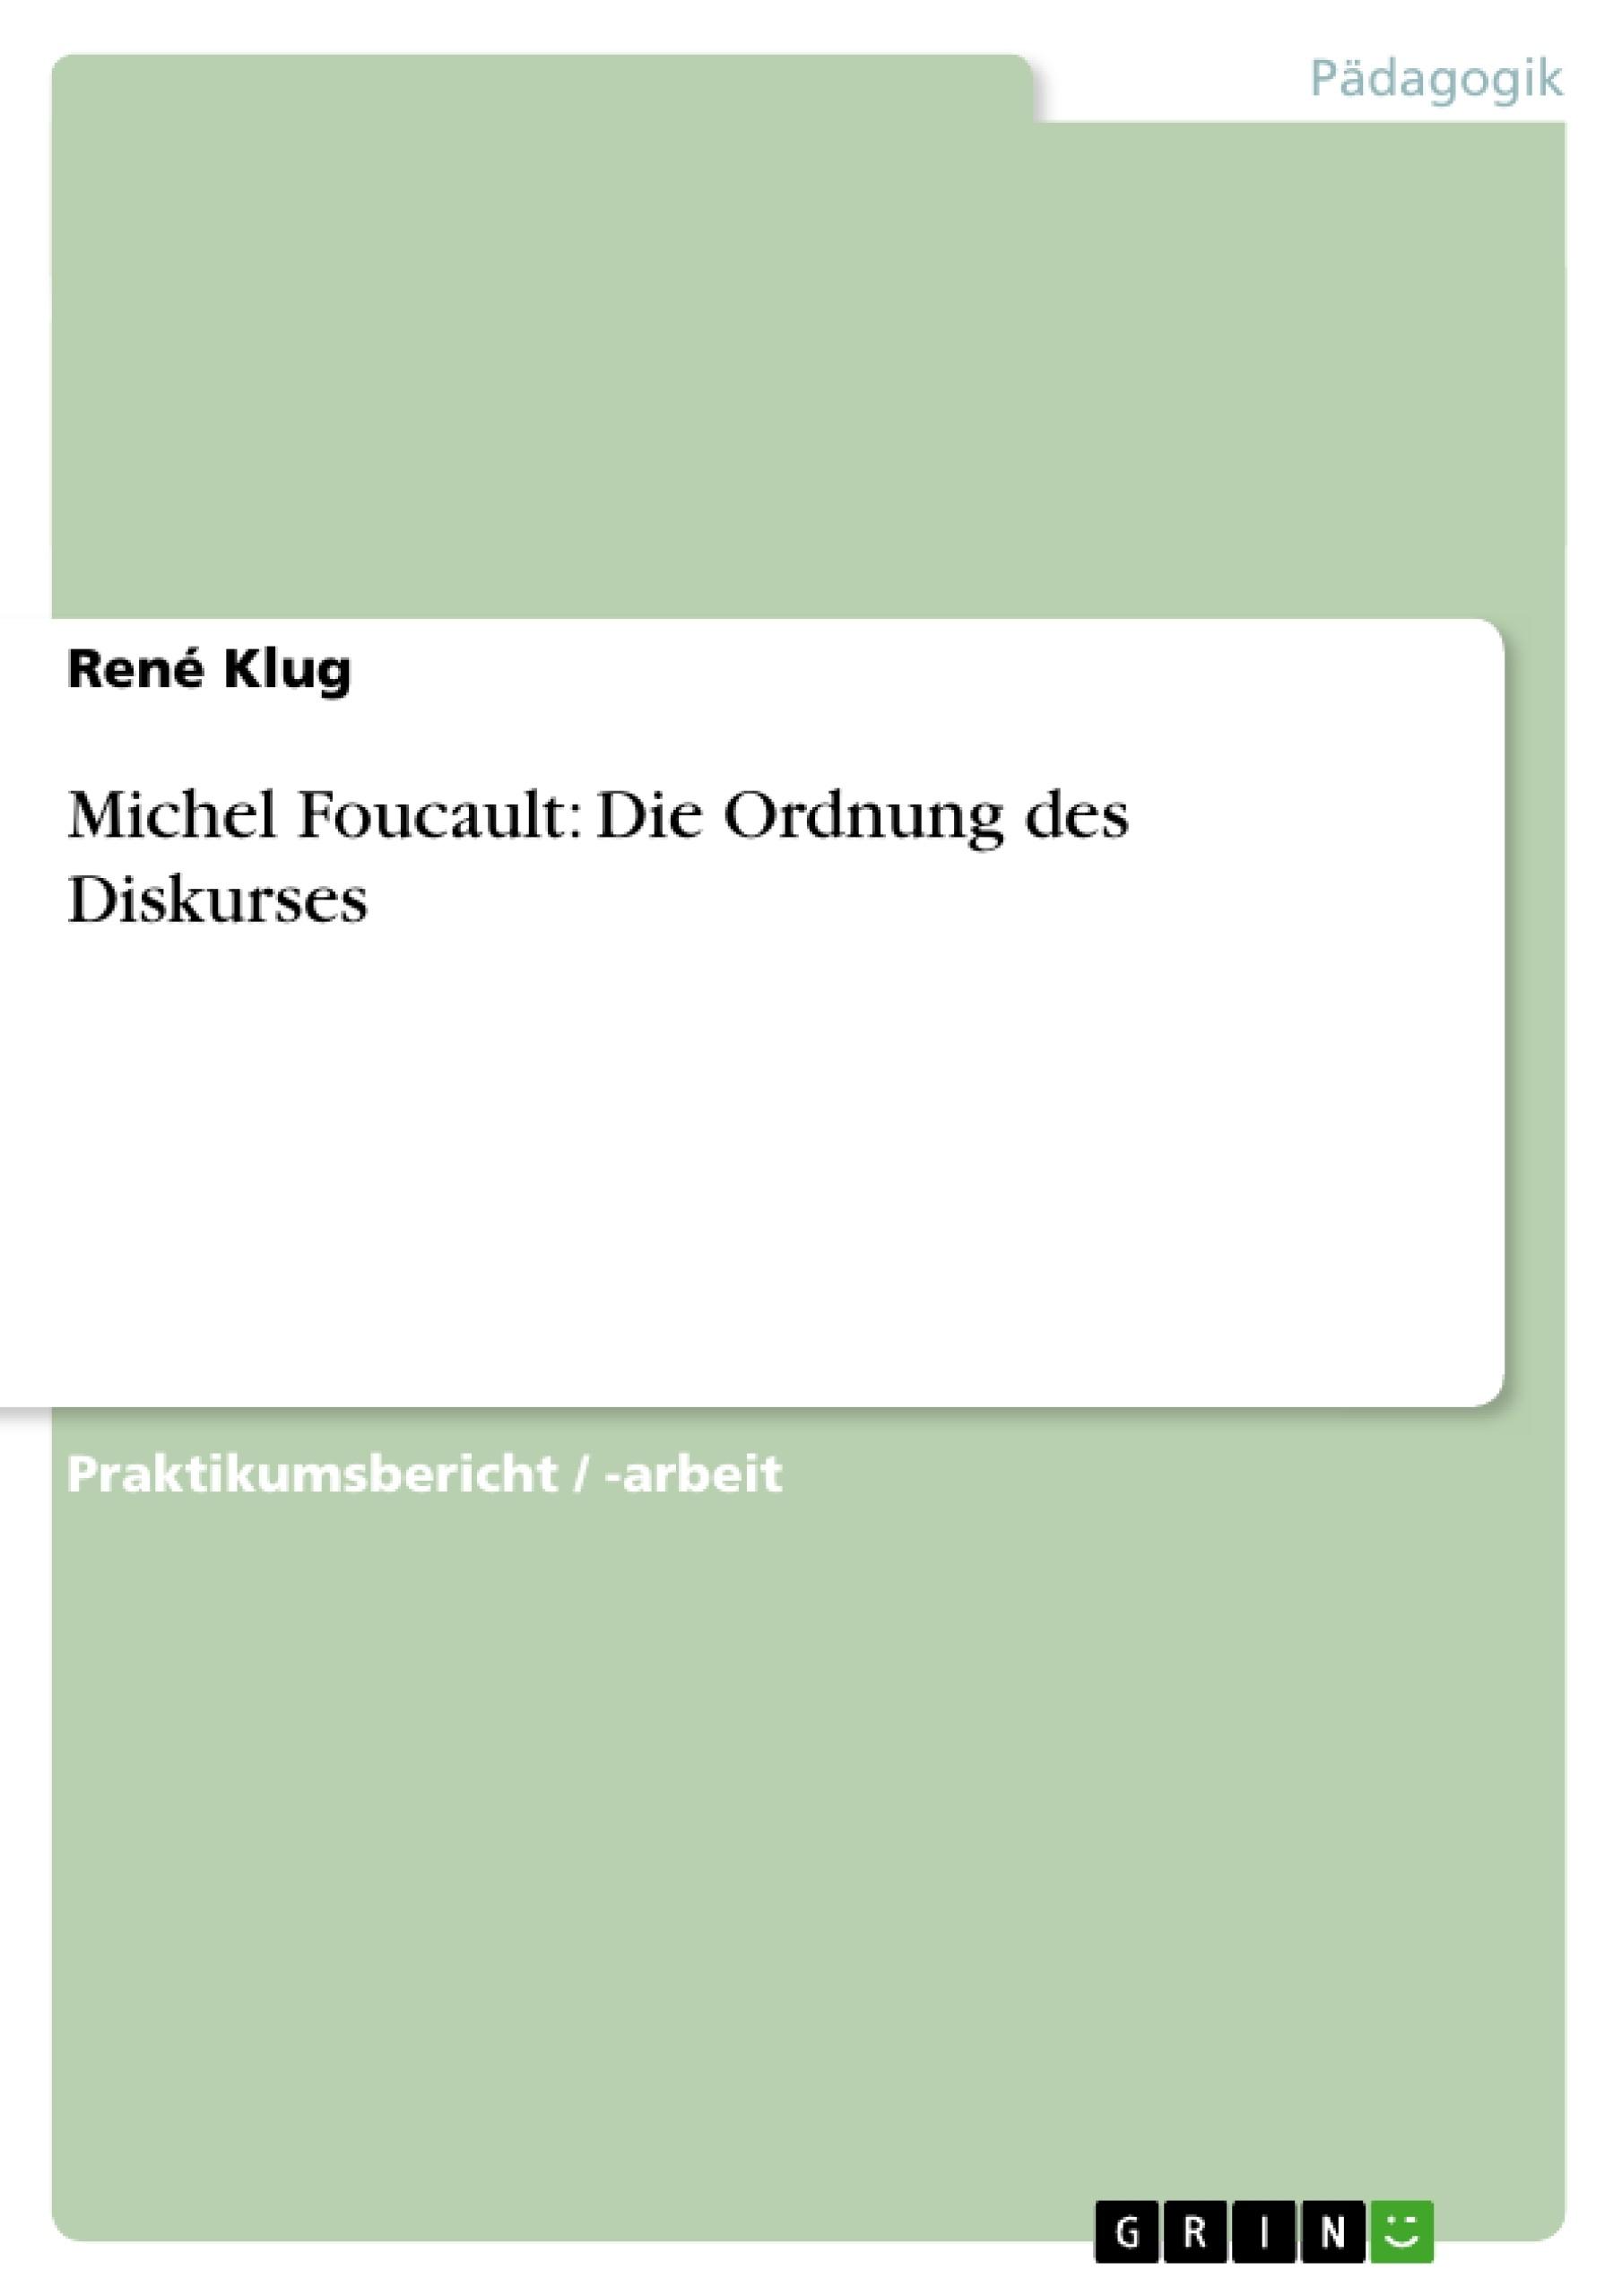 Titel: Michel Foucault: Die Ordnung des Diskurses